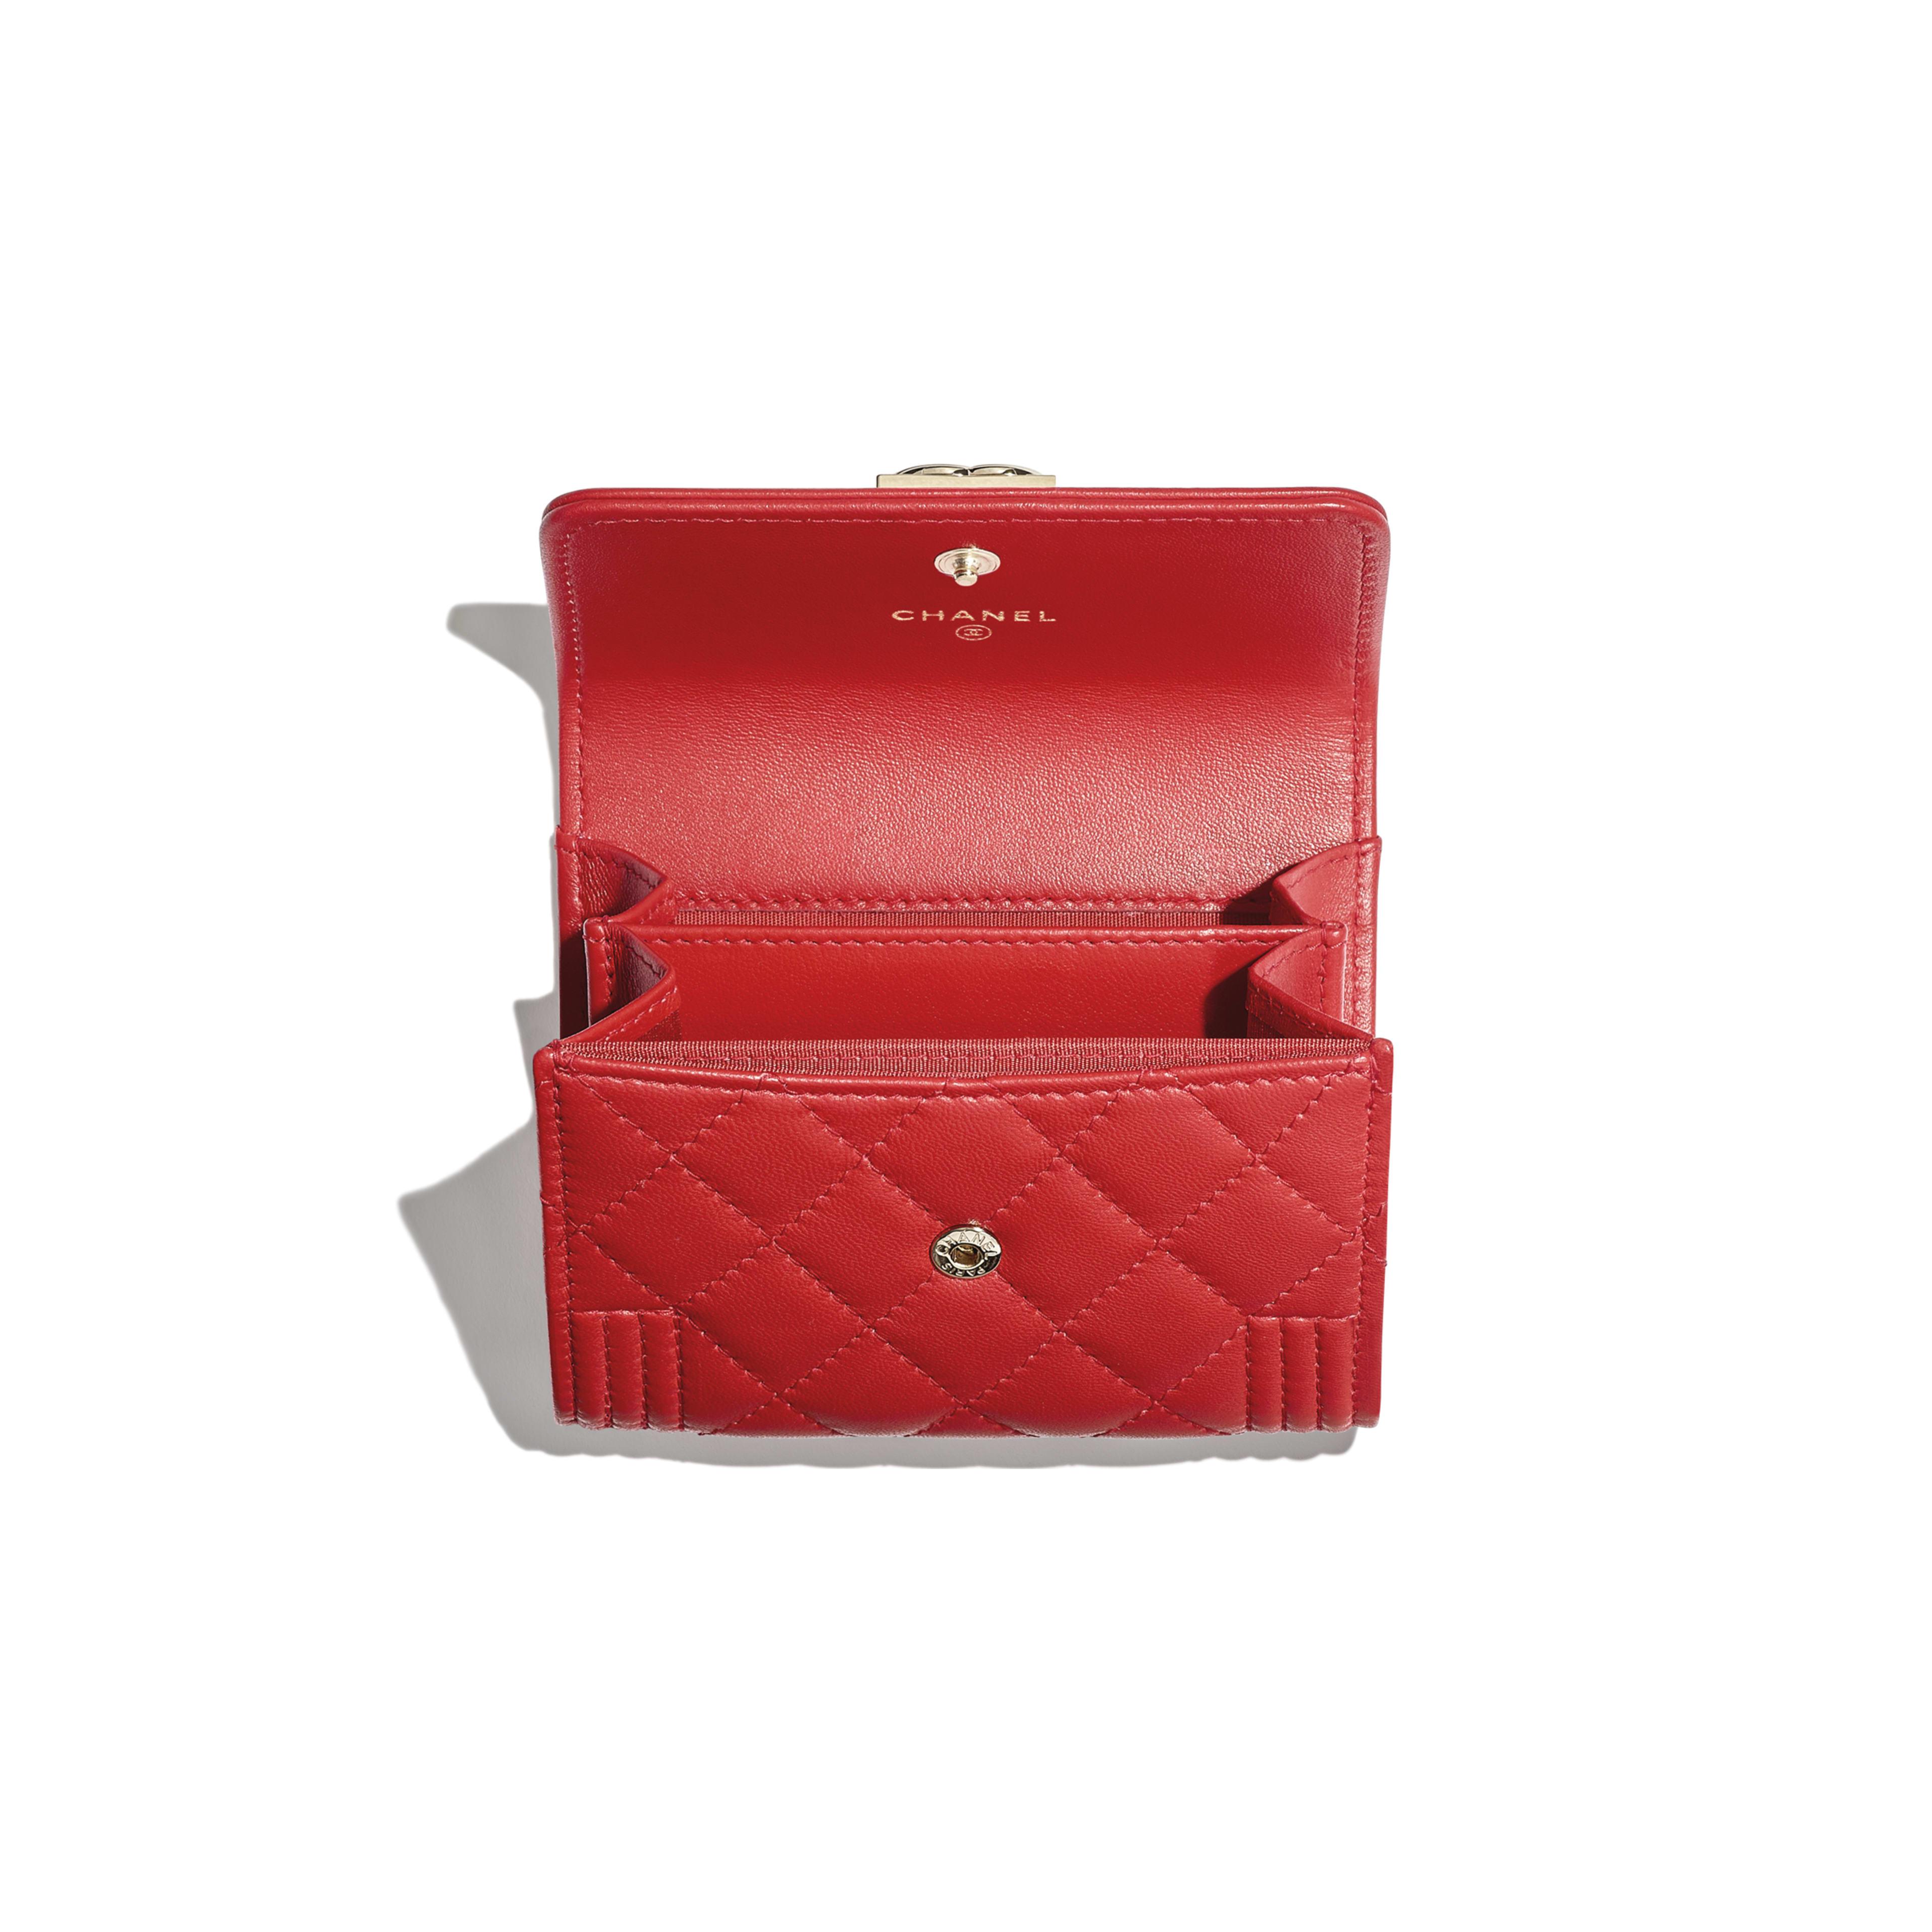 1f5c724d2a75 Lambskin Gold Tone Metal Red Boy Chanel Flap Coin Purse